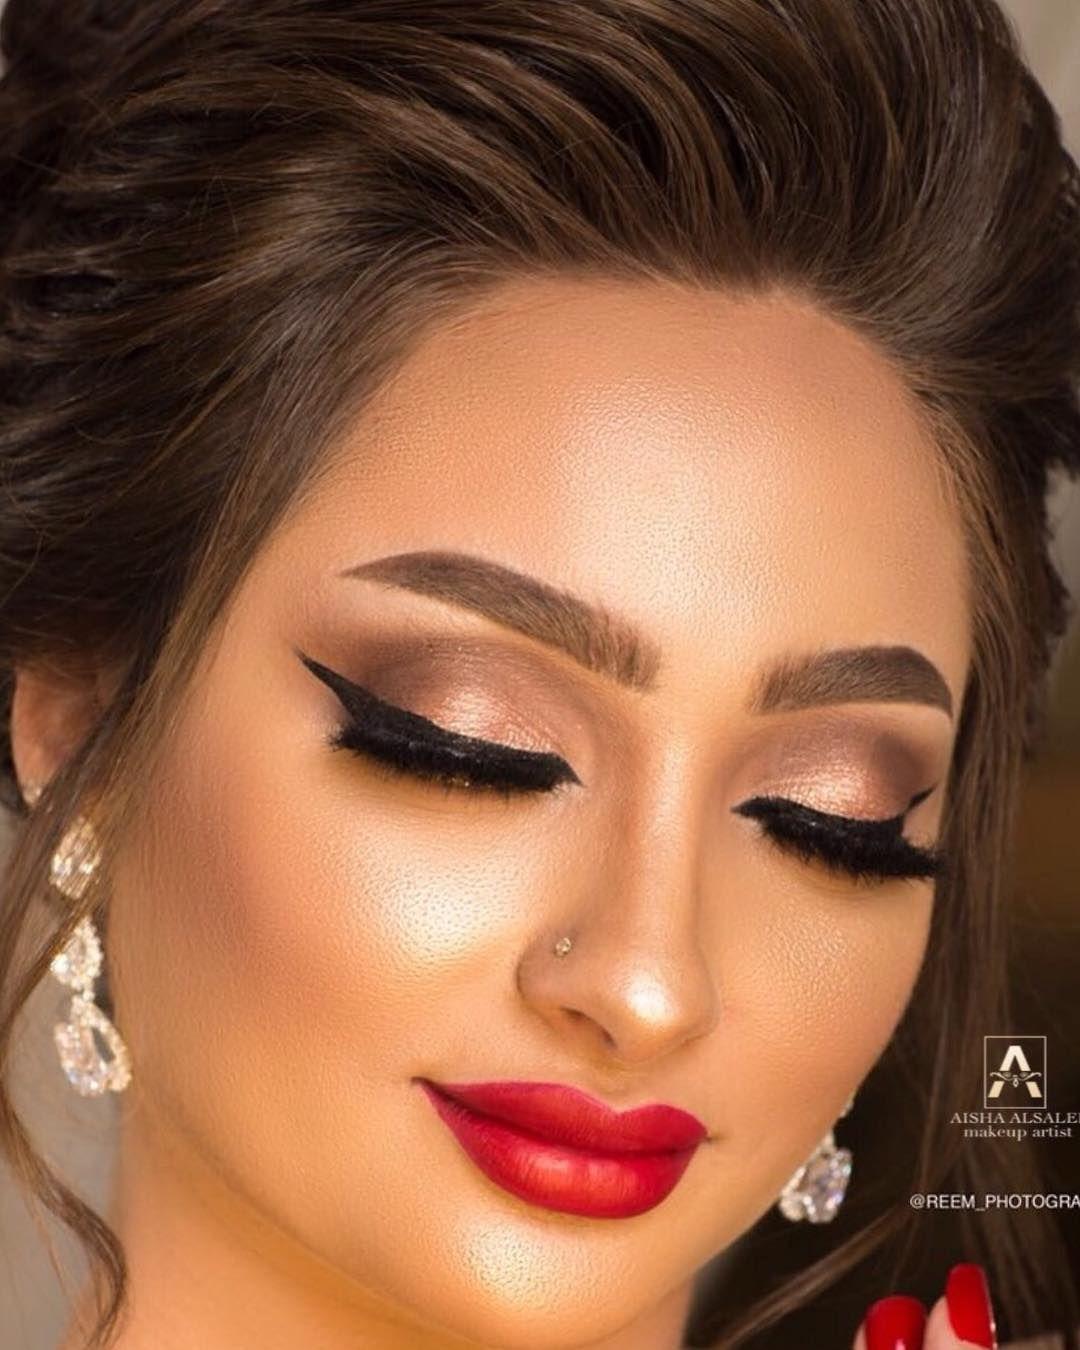 Aisha Alsaleh ترند اكسبلور فخم بنات جده مكياج ناعم فخم عروس بنات مكياج للستفسار عرايس Aisha Lipstick Mua